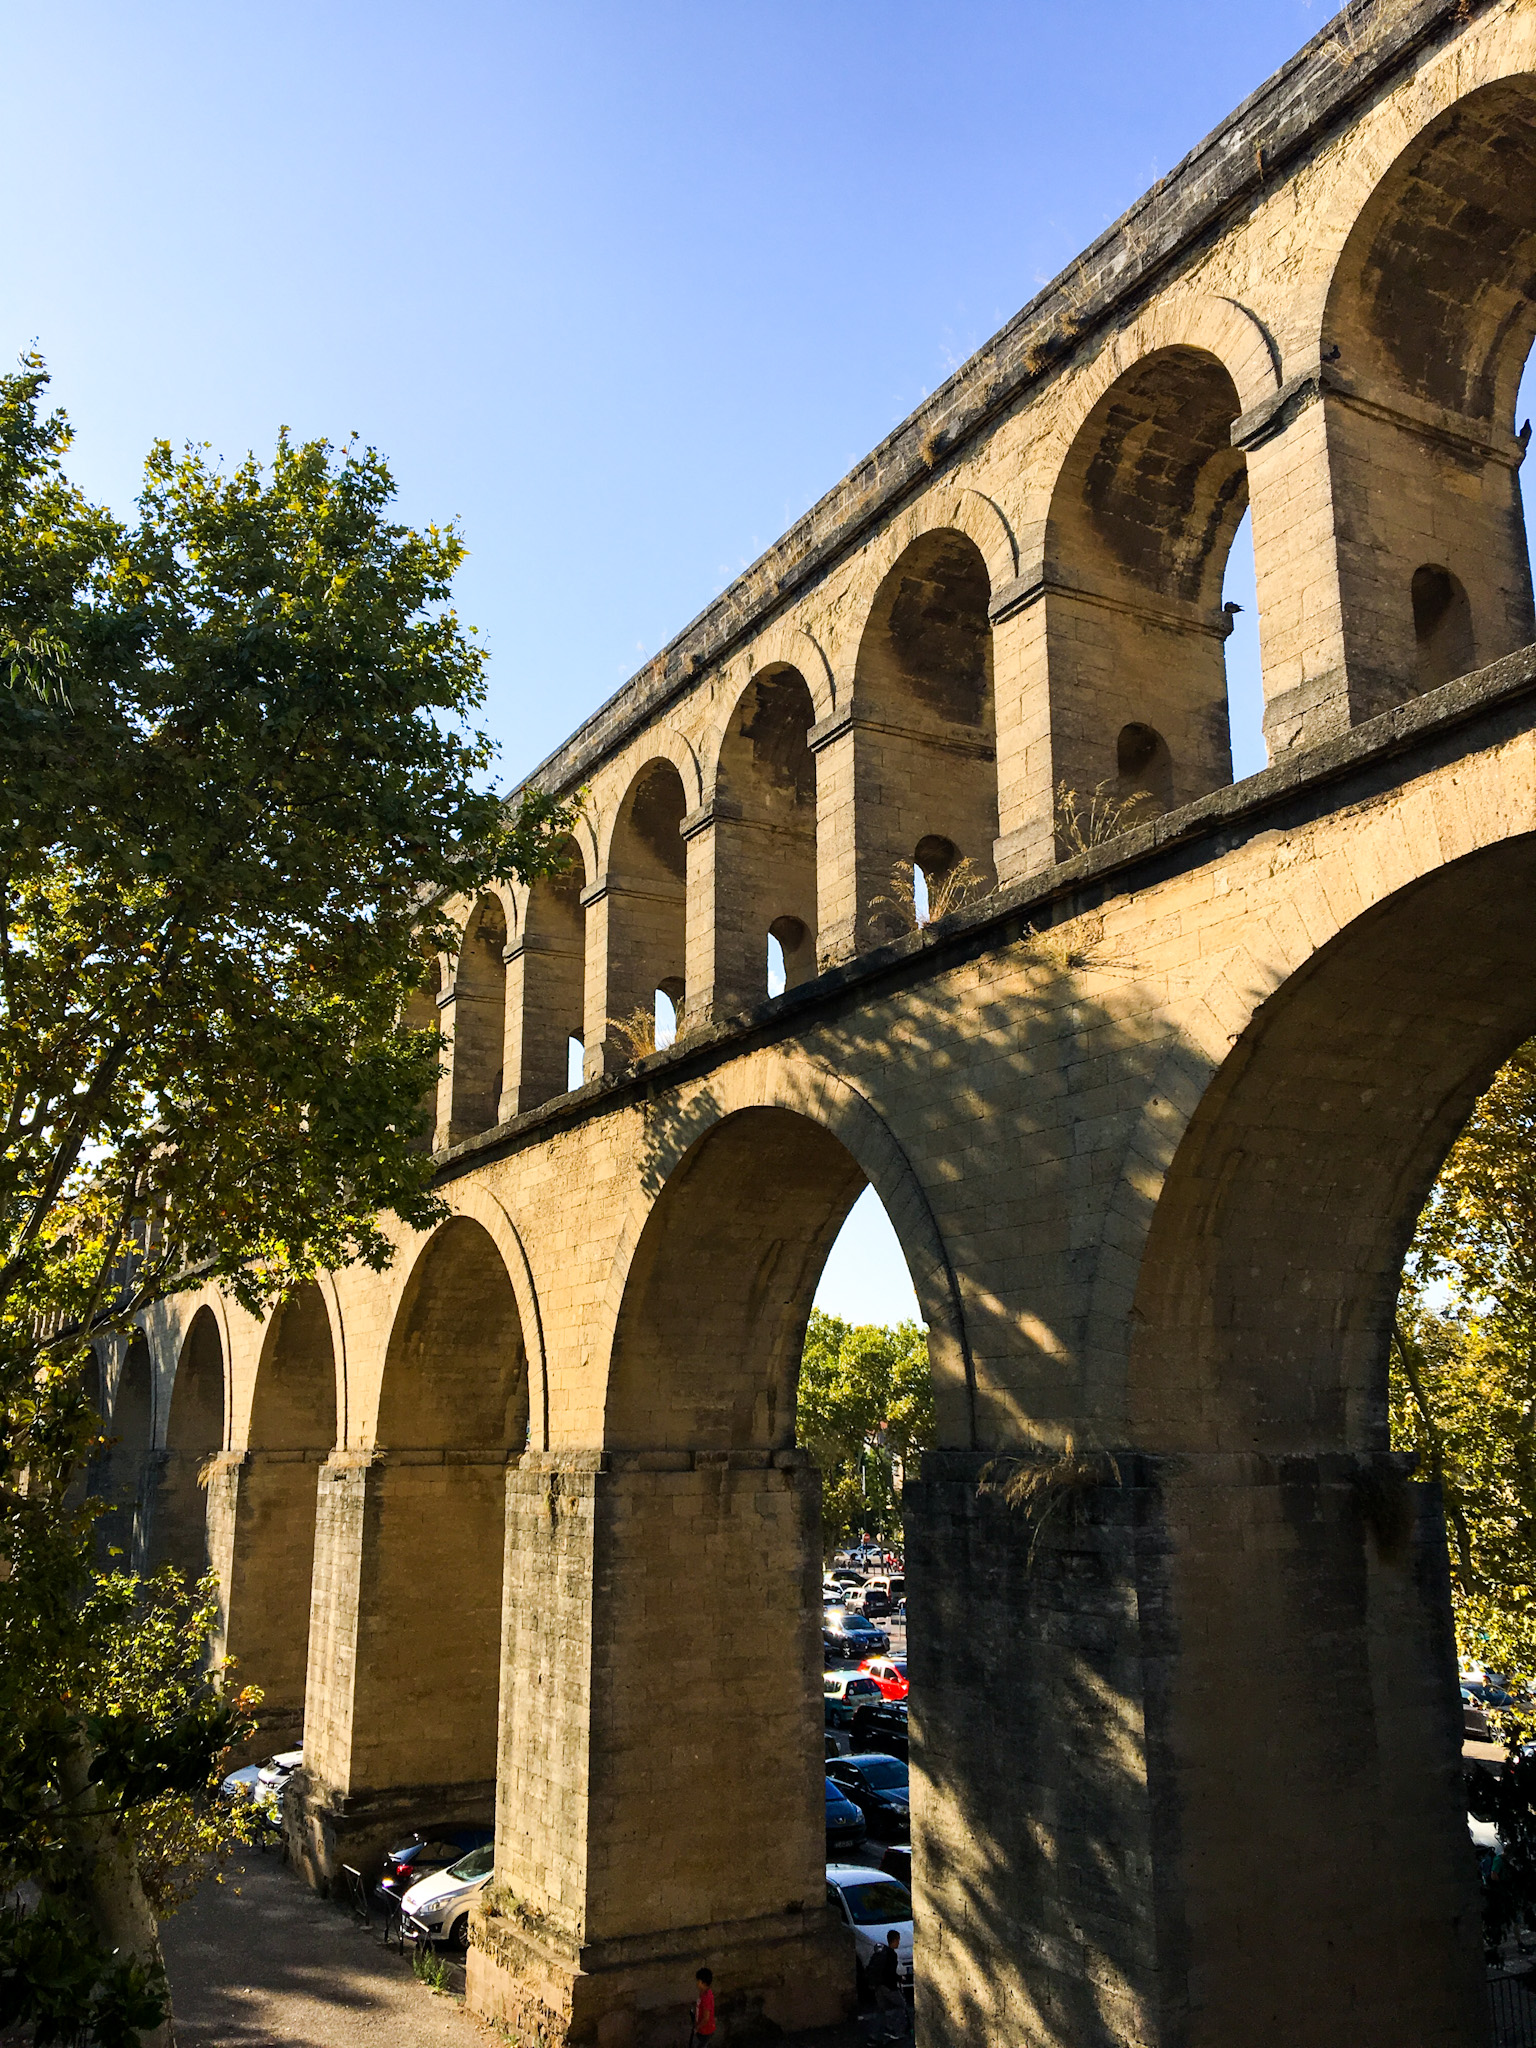 architecture travel guide Montpellier, France - ANTIGONE